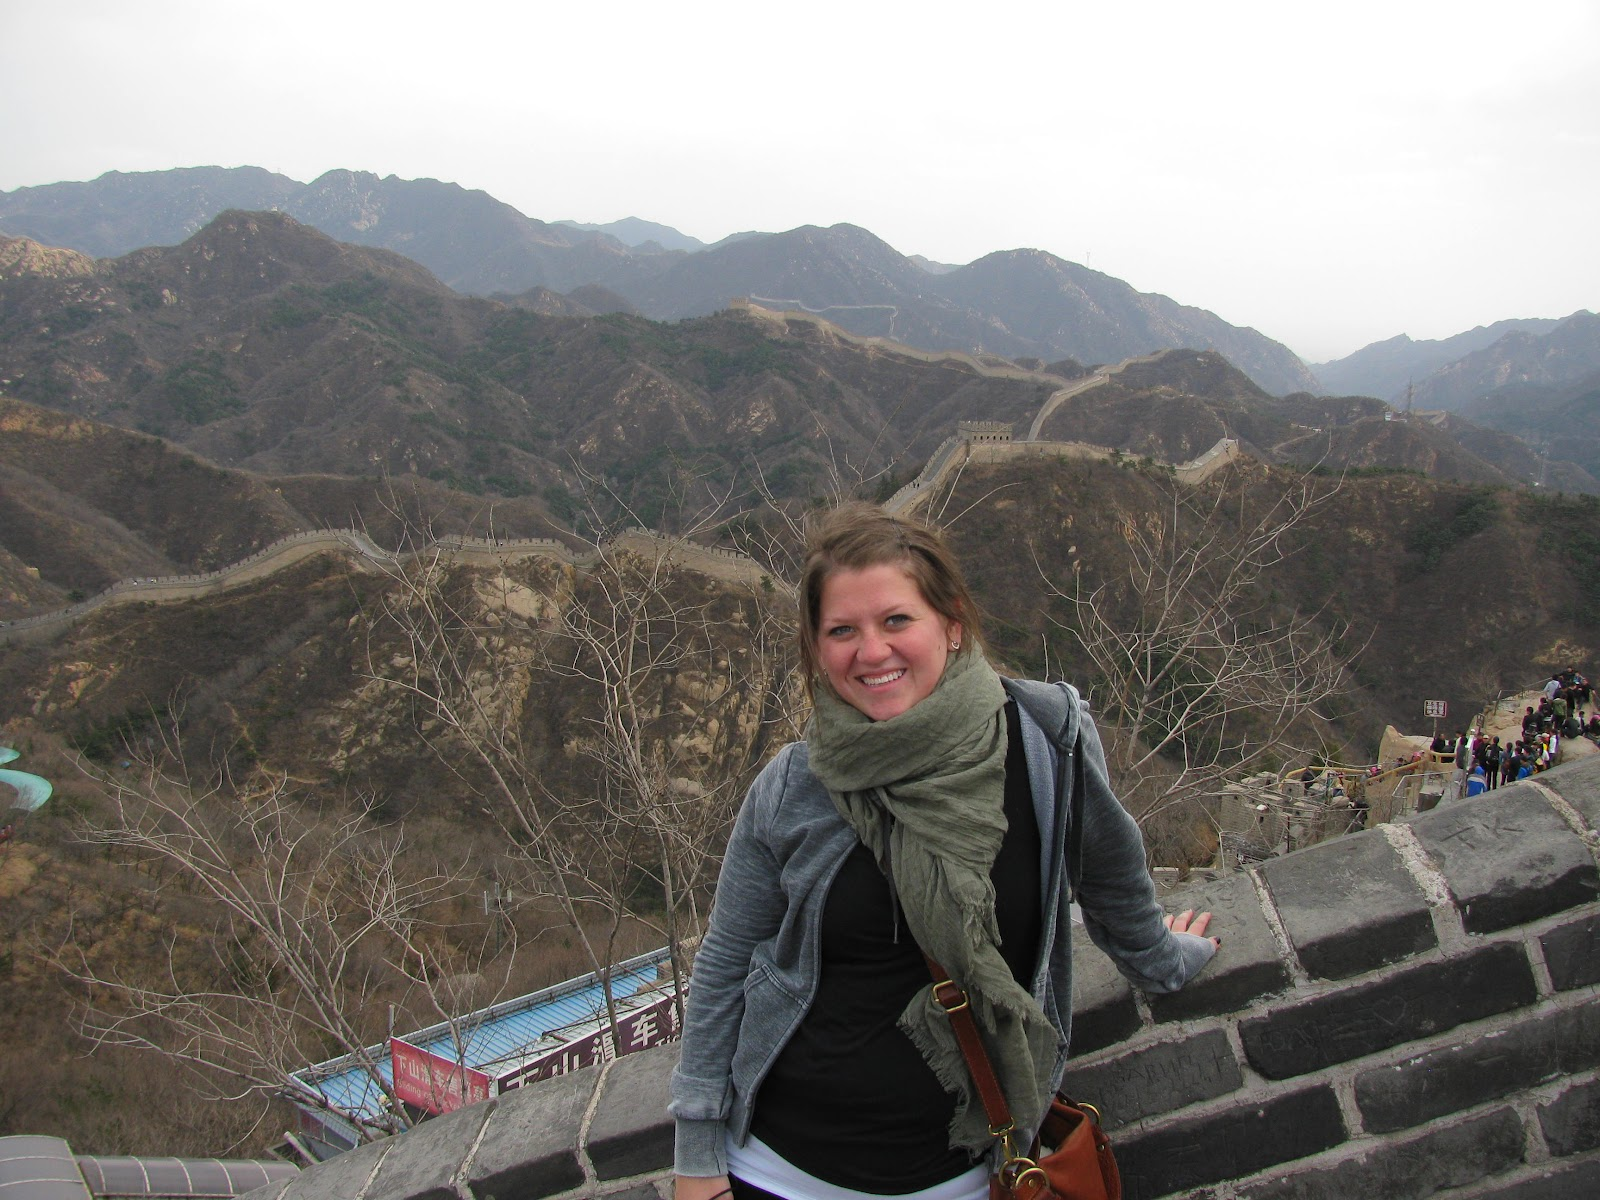 http://1.bp.blogspot.com/-d4rD-1qv7H8/T4iFBJyl-FI/AAAAAAAABEQ/hOlKCuzc3YA/s1600/Great+Wall,+Beijing.JPG